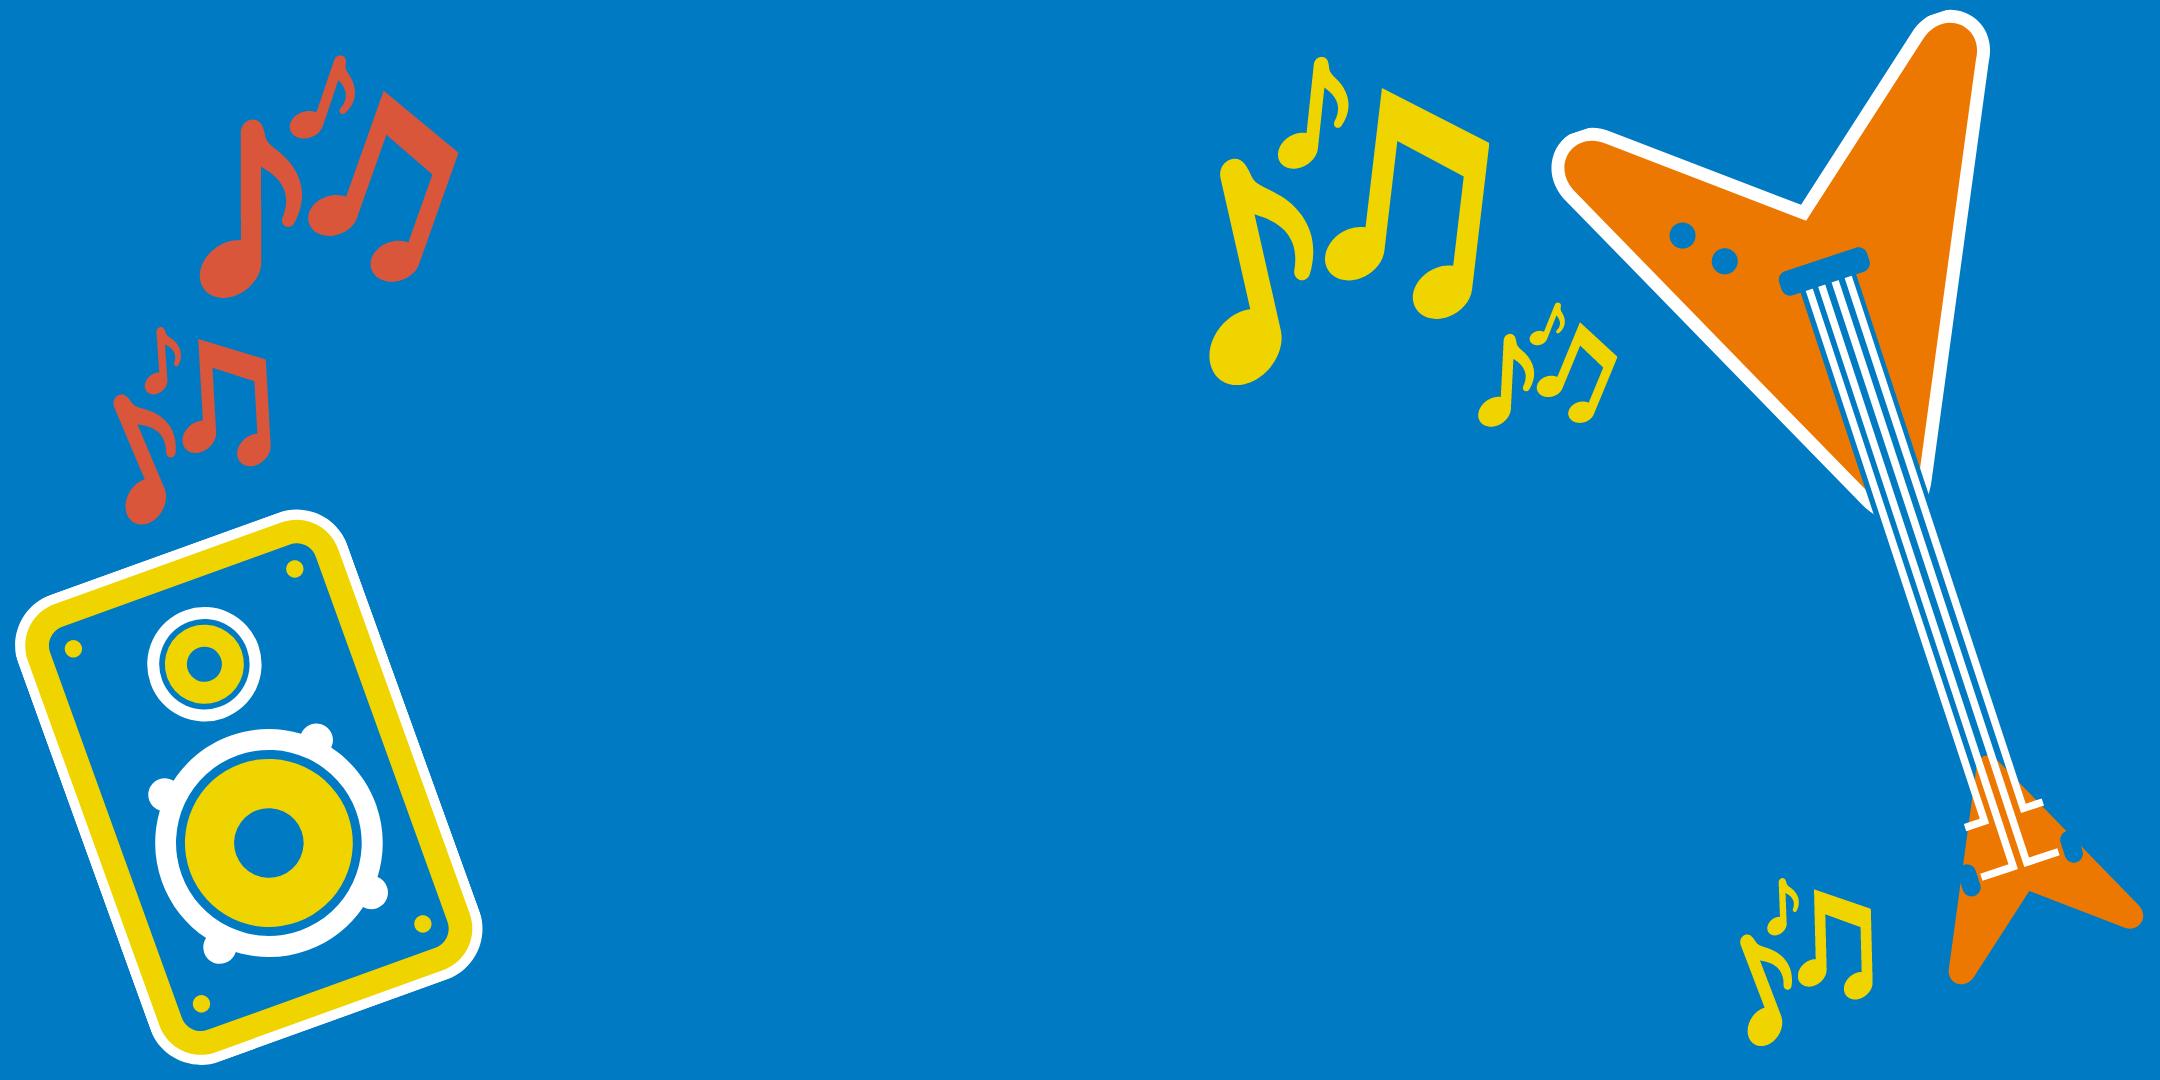 All Rejoice! Building Bridges Through Music